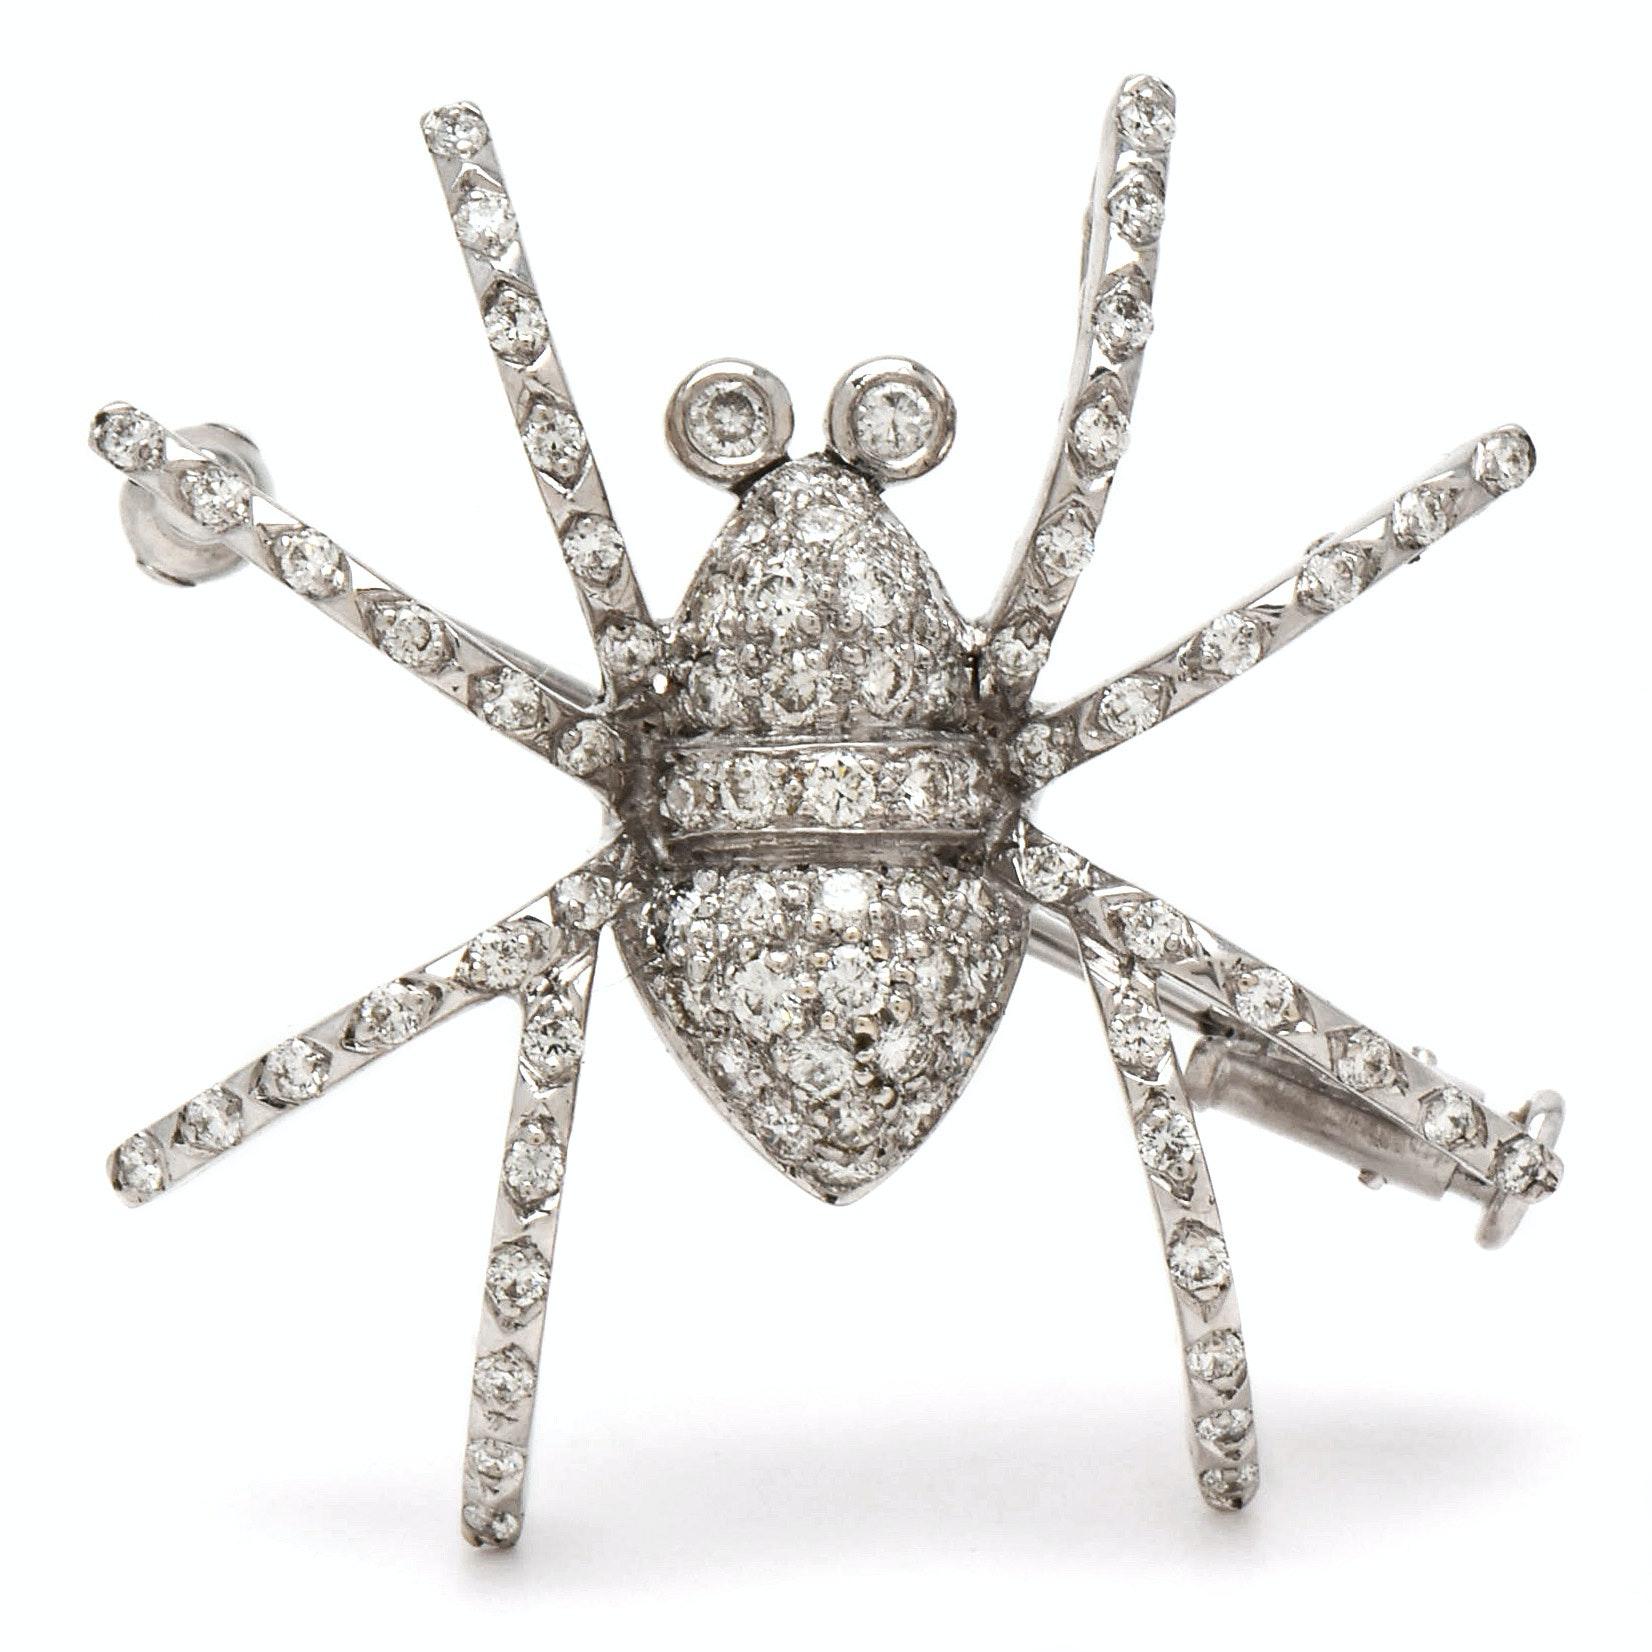 18K White Gold Diamond Spider Brooch with 14K White Gold Stem Pin